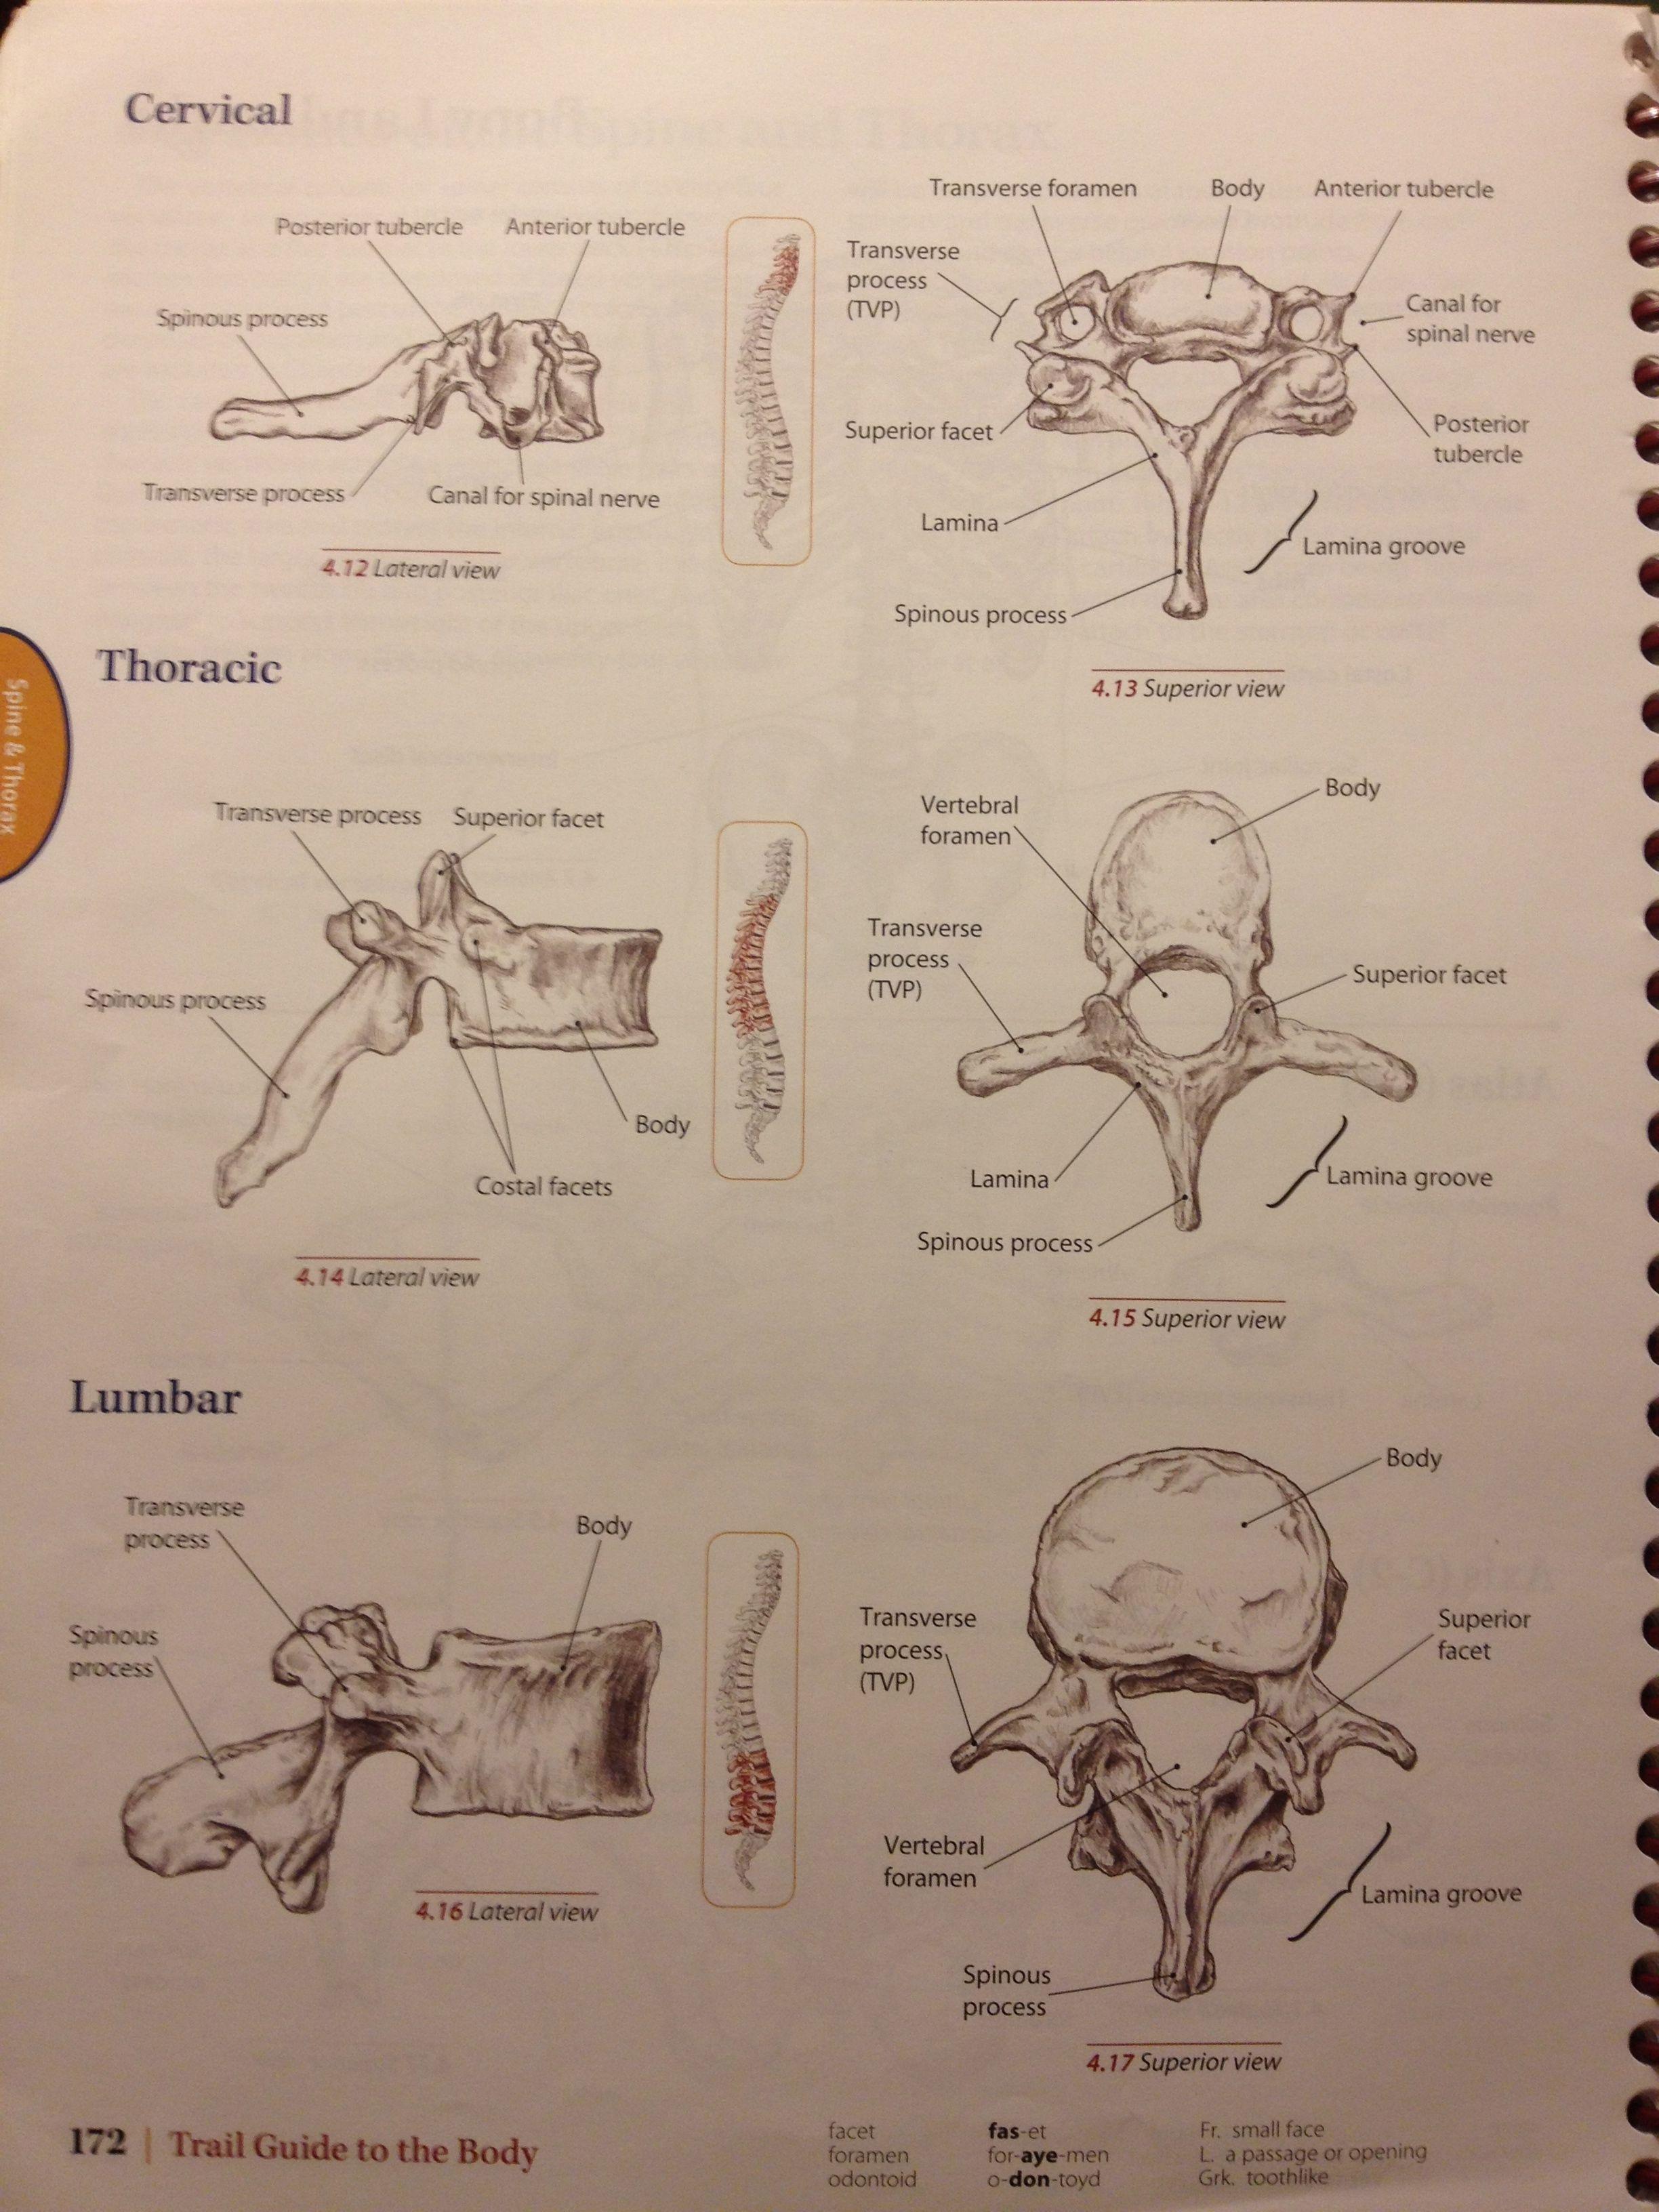 Bony Landmarks Of Cervical Thoracic And Lumbar Vertebrae